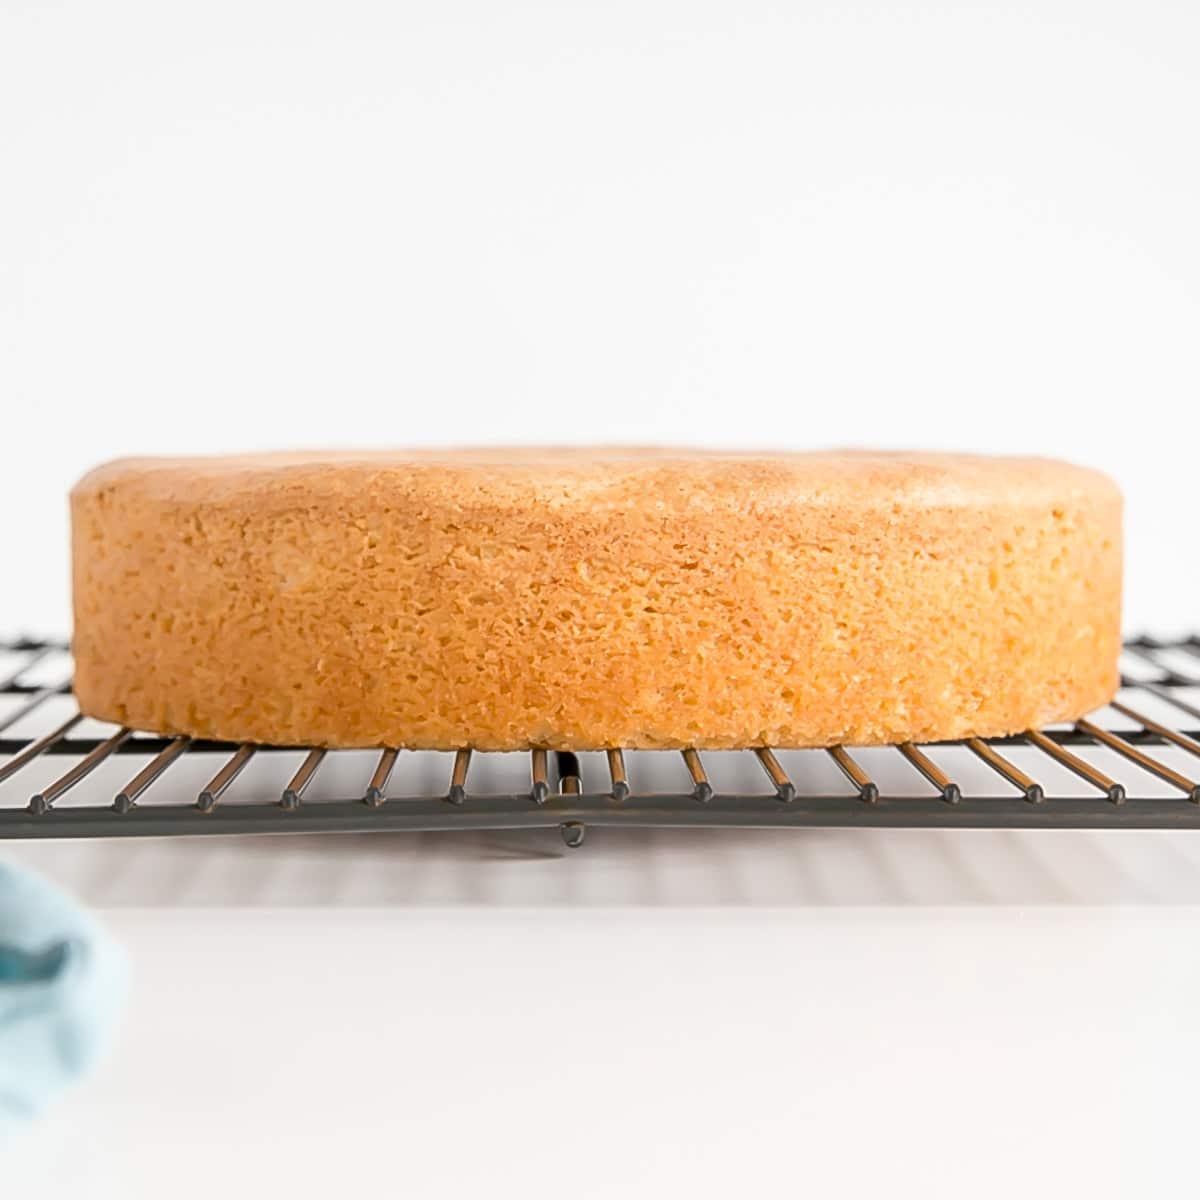 2 x Cake Pan Strips Bake Even Strips Purple Bake Moist Level Cake Baking Tool